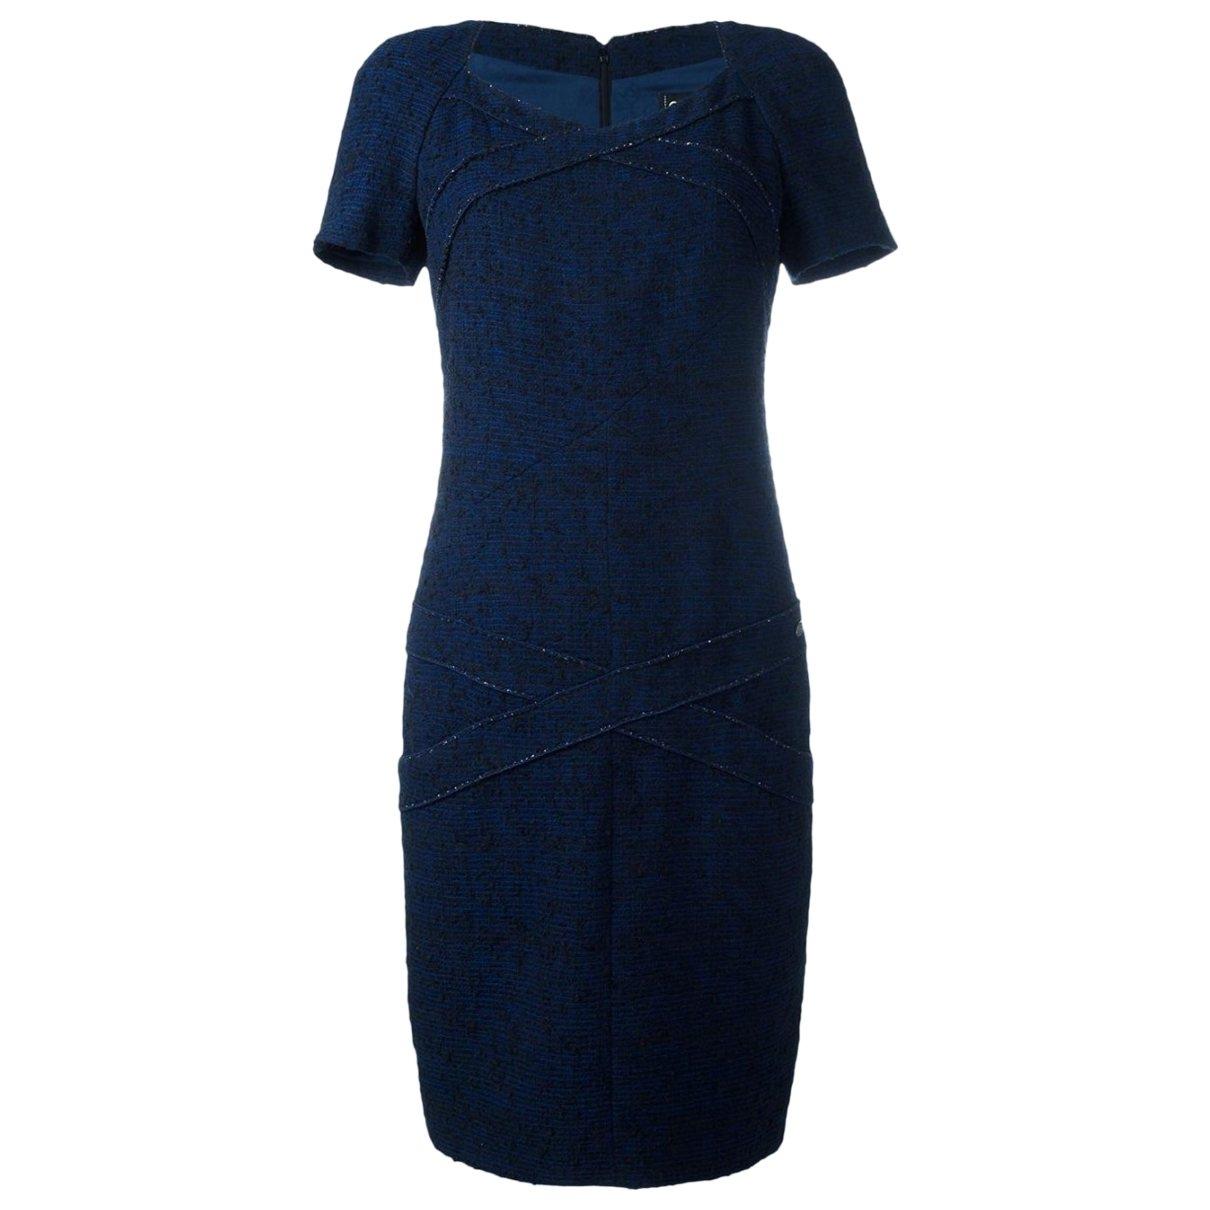 Chanel \N Navy Cotton - elasthane dress for Women 40 FR